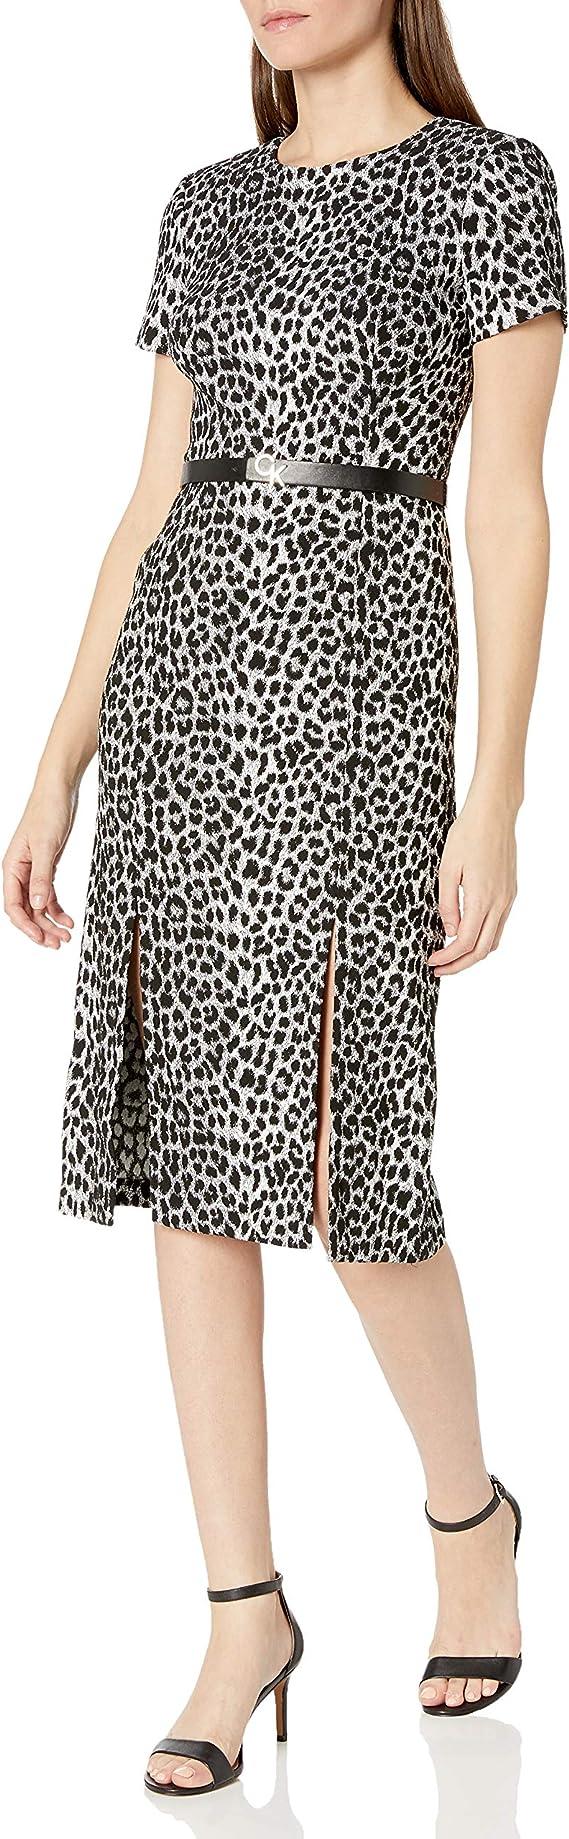 Calvin Klein 卡尔文克莱因 CK 豹纹印花 女式连衣裙 3折$35.99 海淘转运到手约¥285